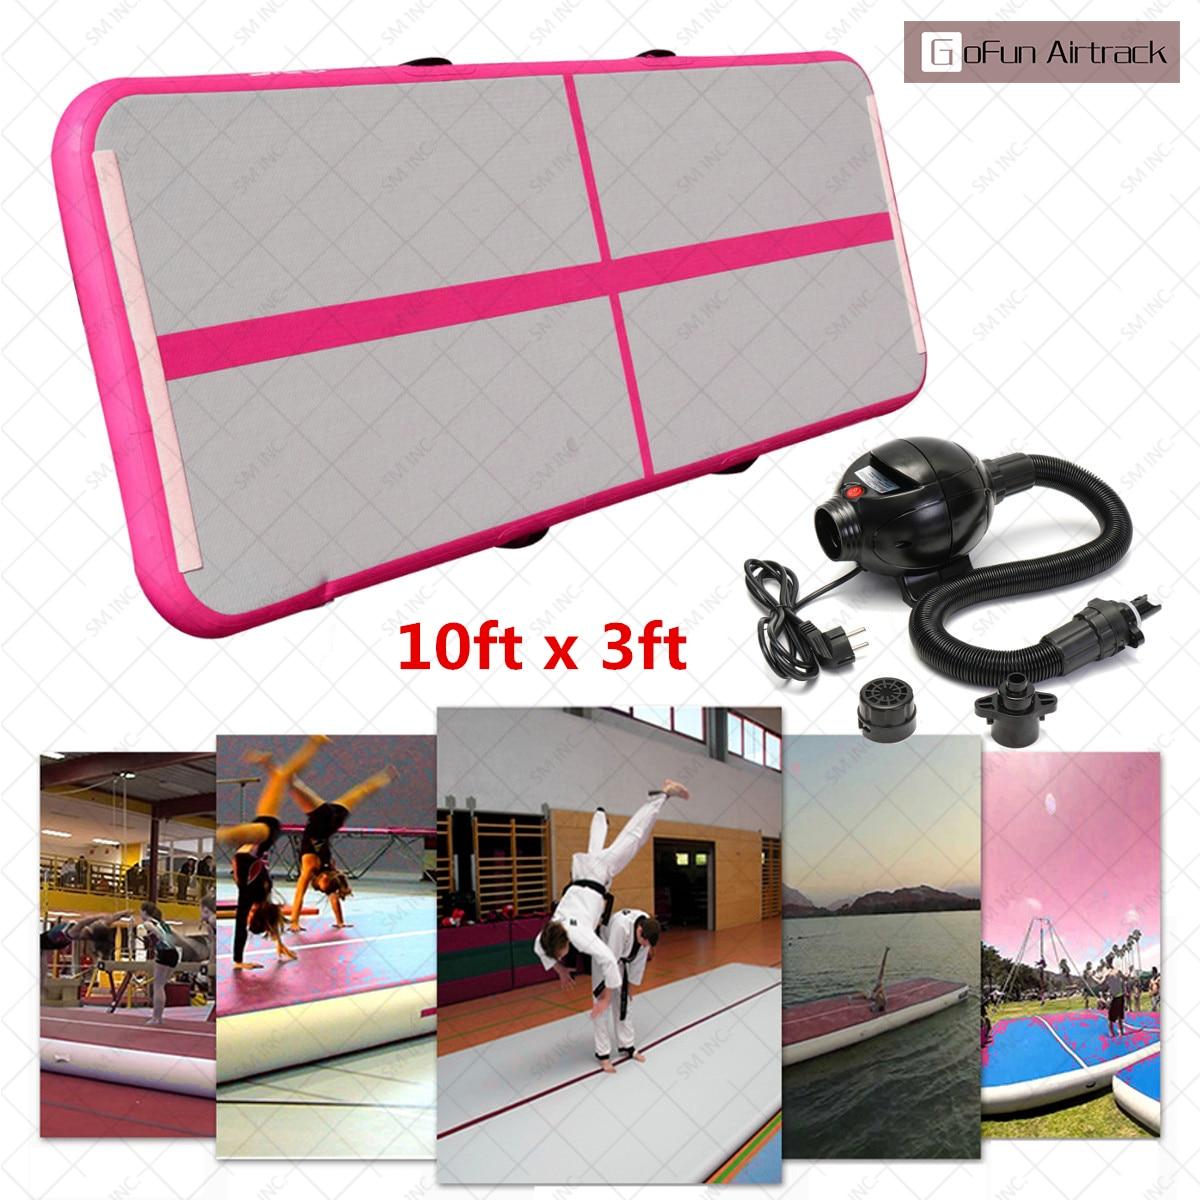 Gofun 118x35x4inch Air Tracks Floor Home Gymnastics Tumbling Mat Inflatable Air Tumbling Track GYM все цены